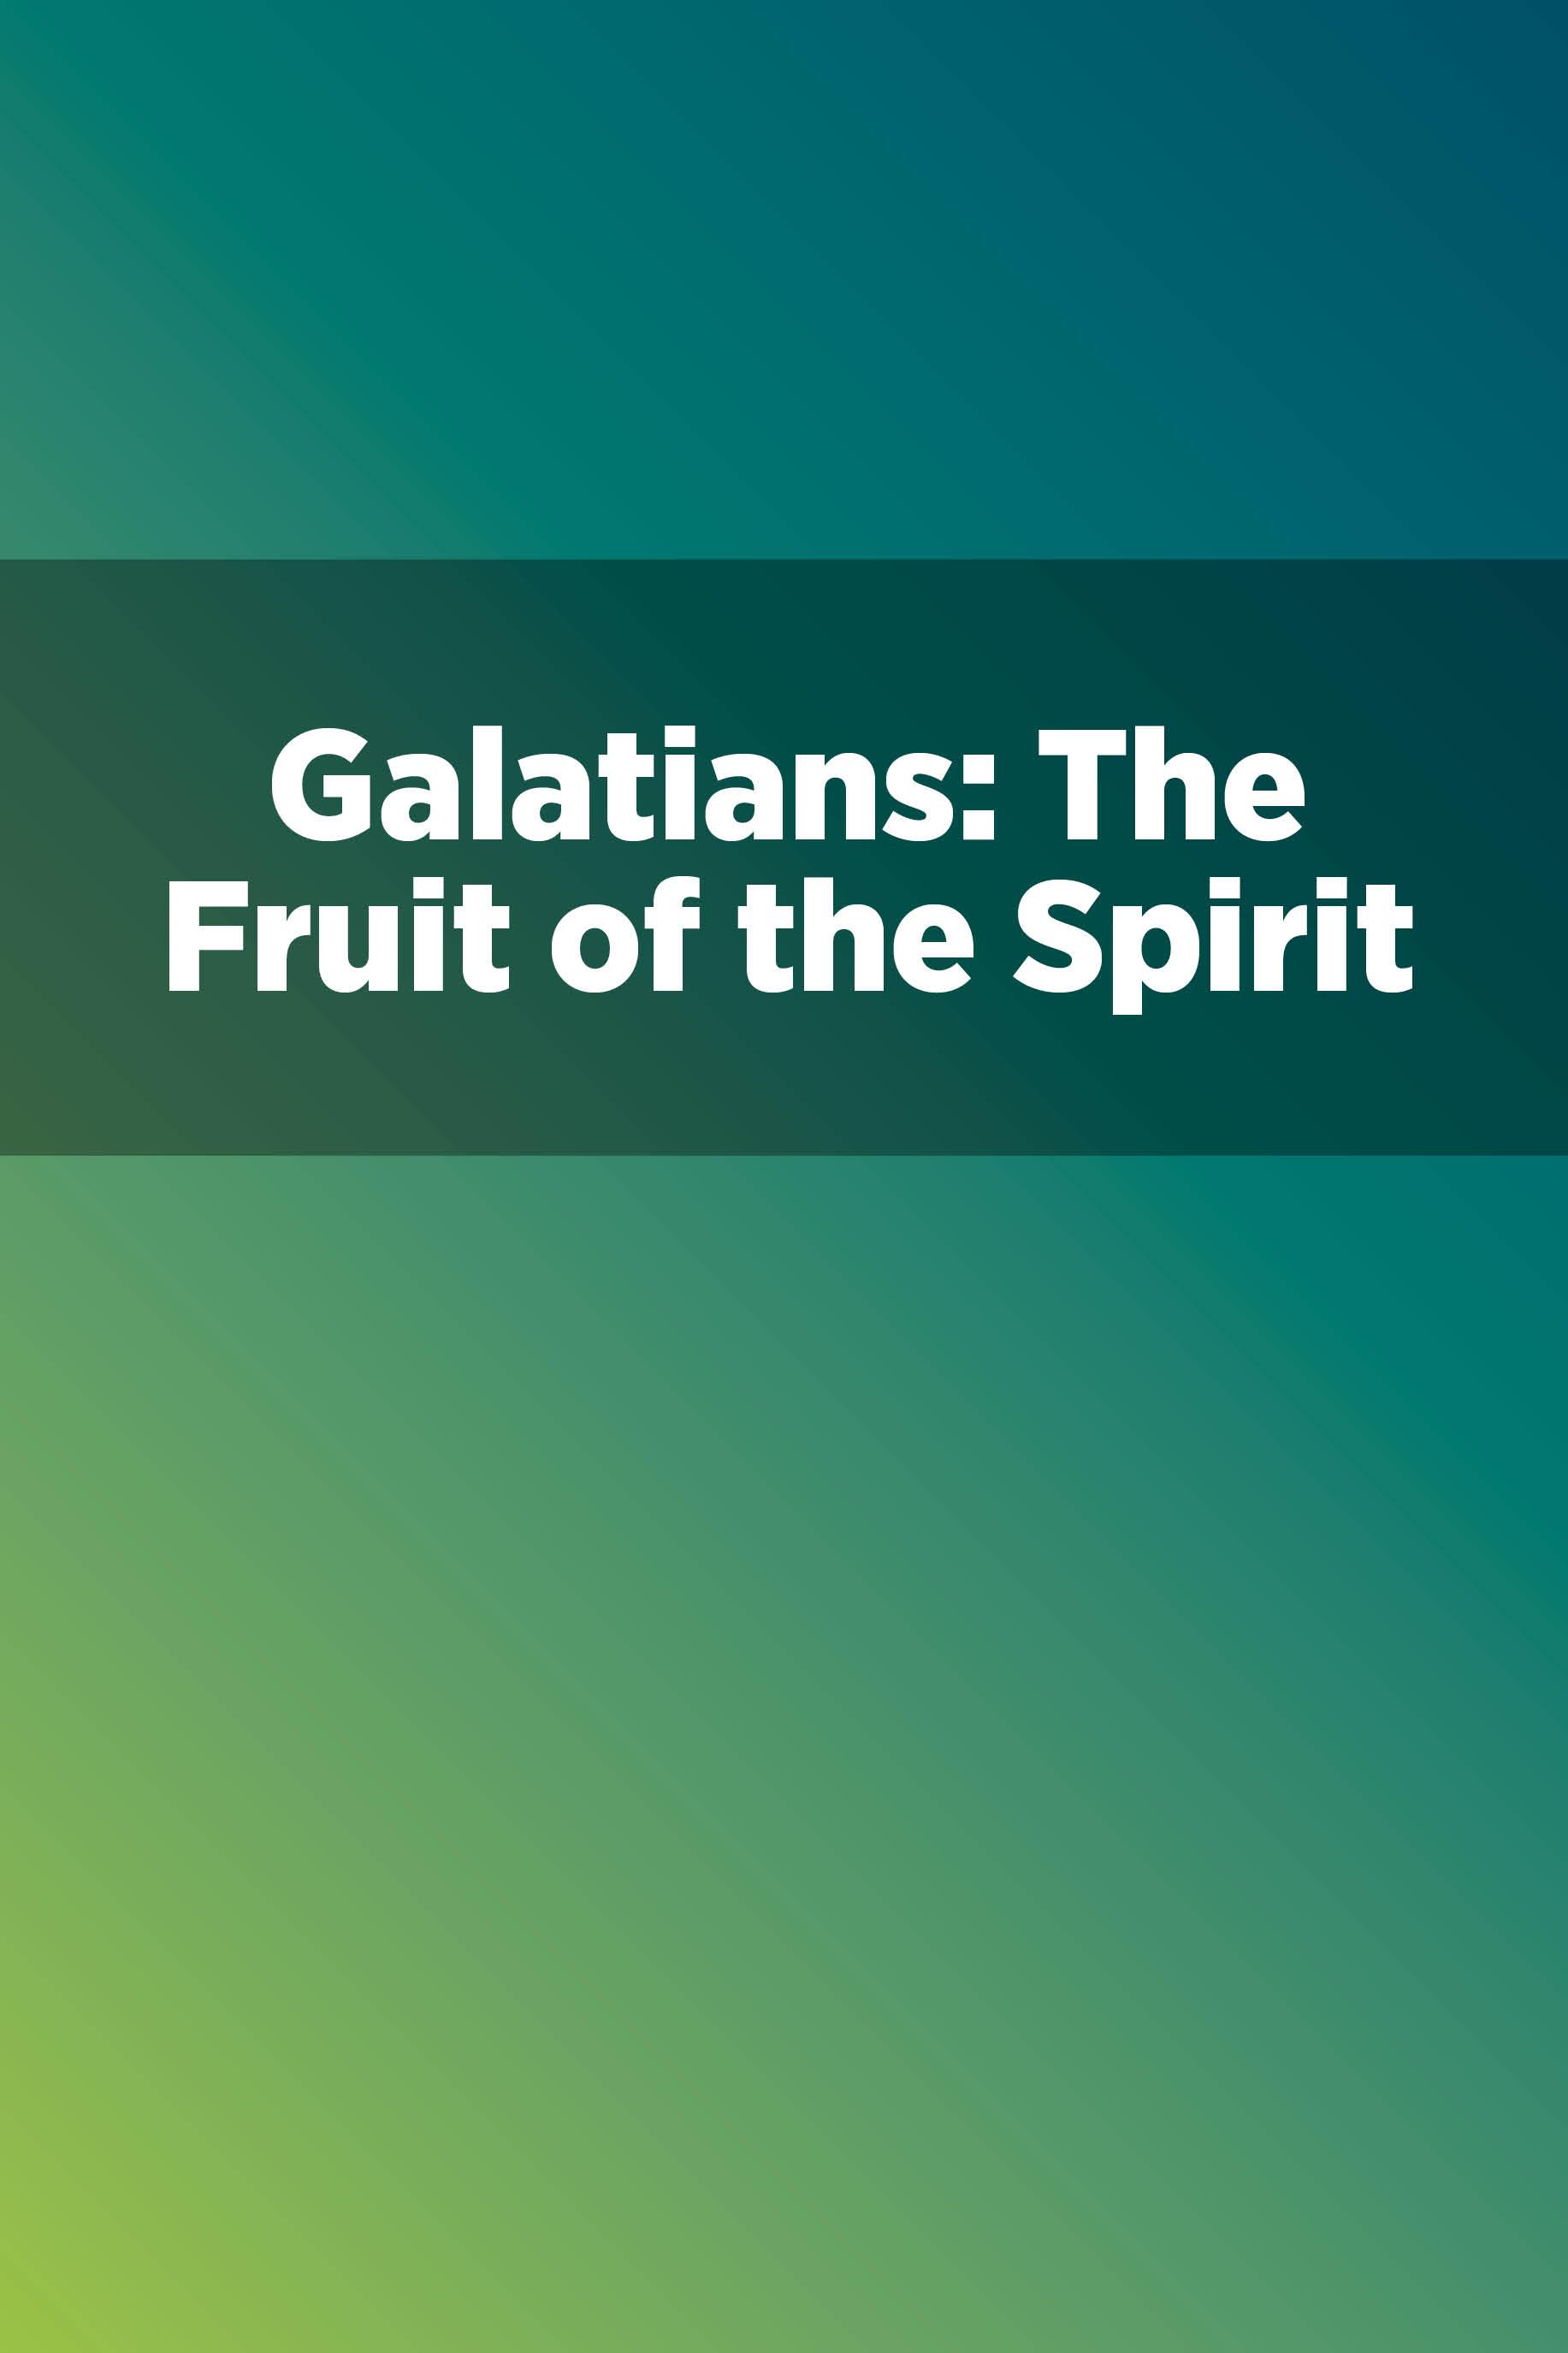 Galatians: The Fruit of the Spirit